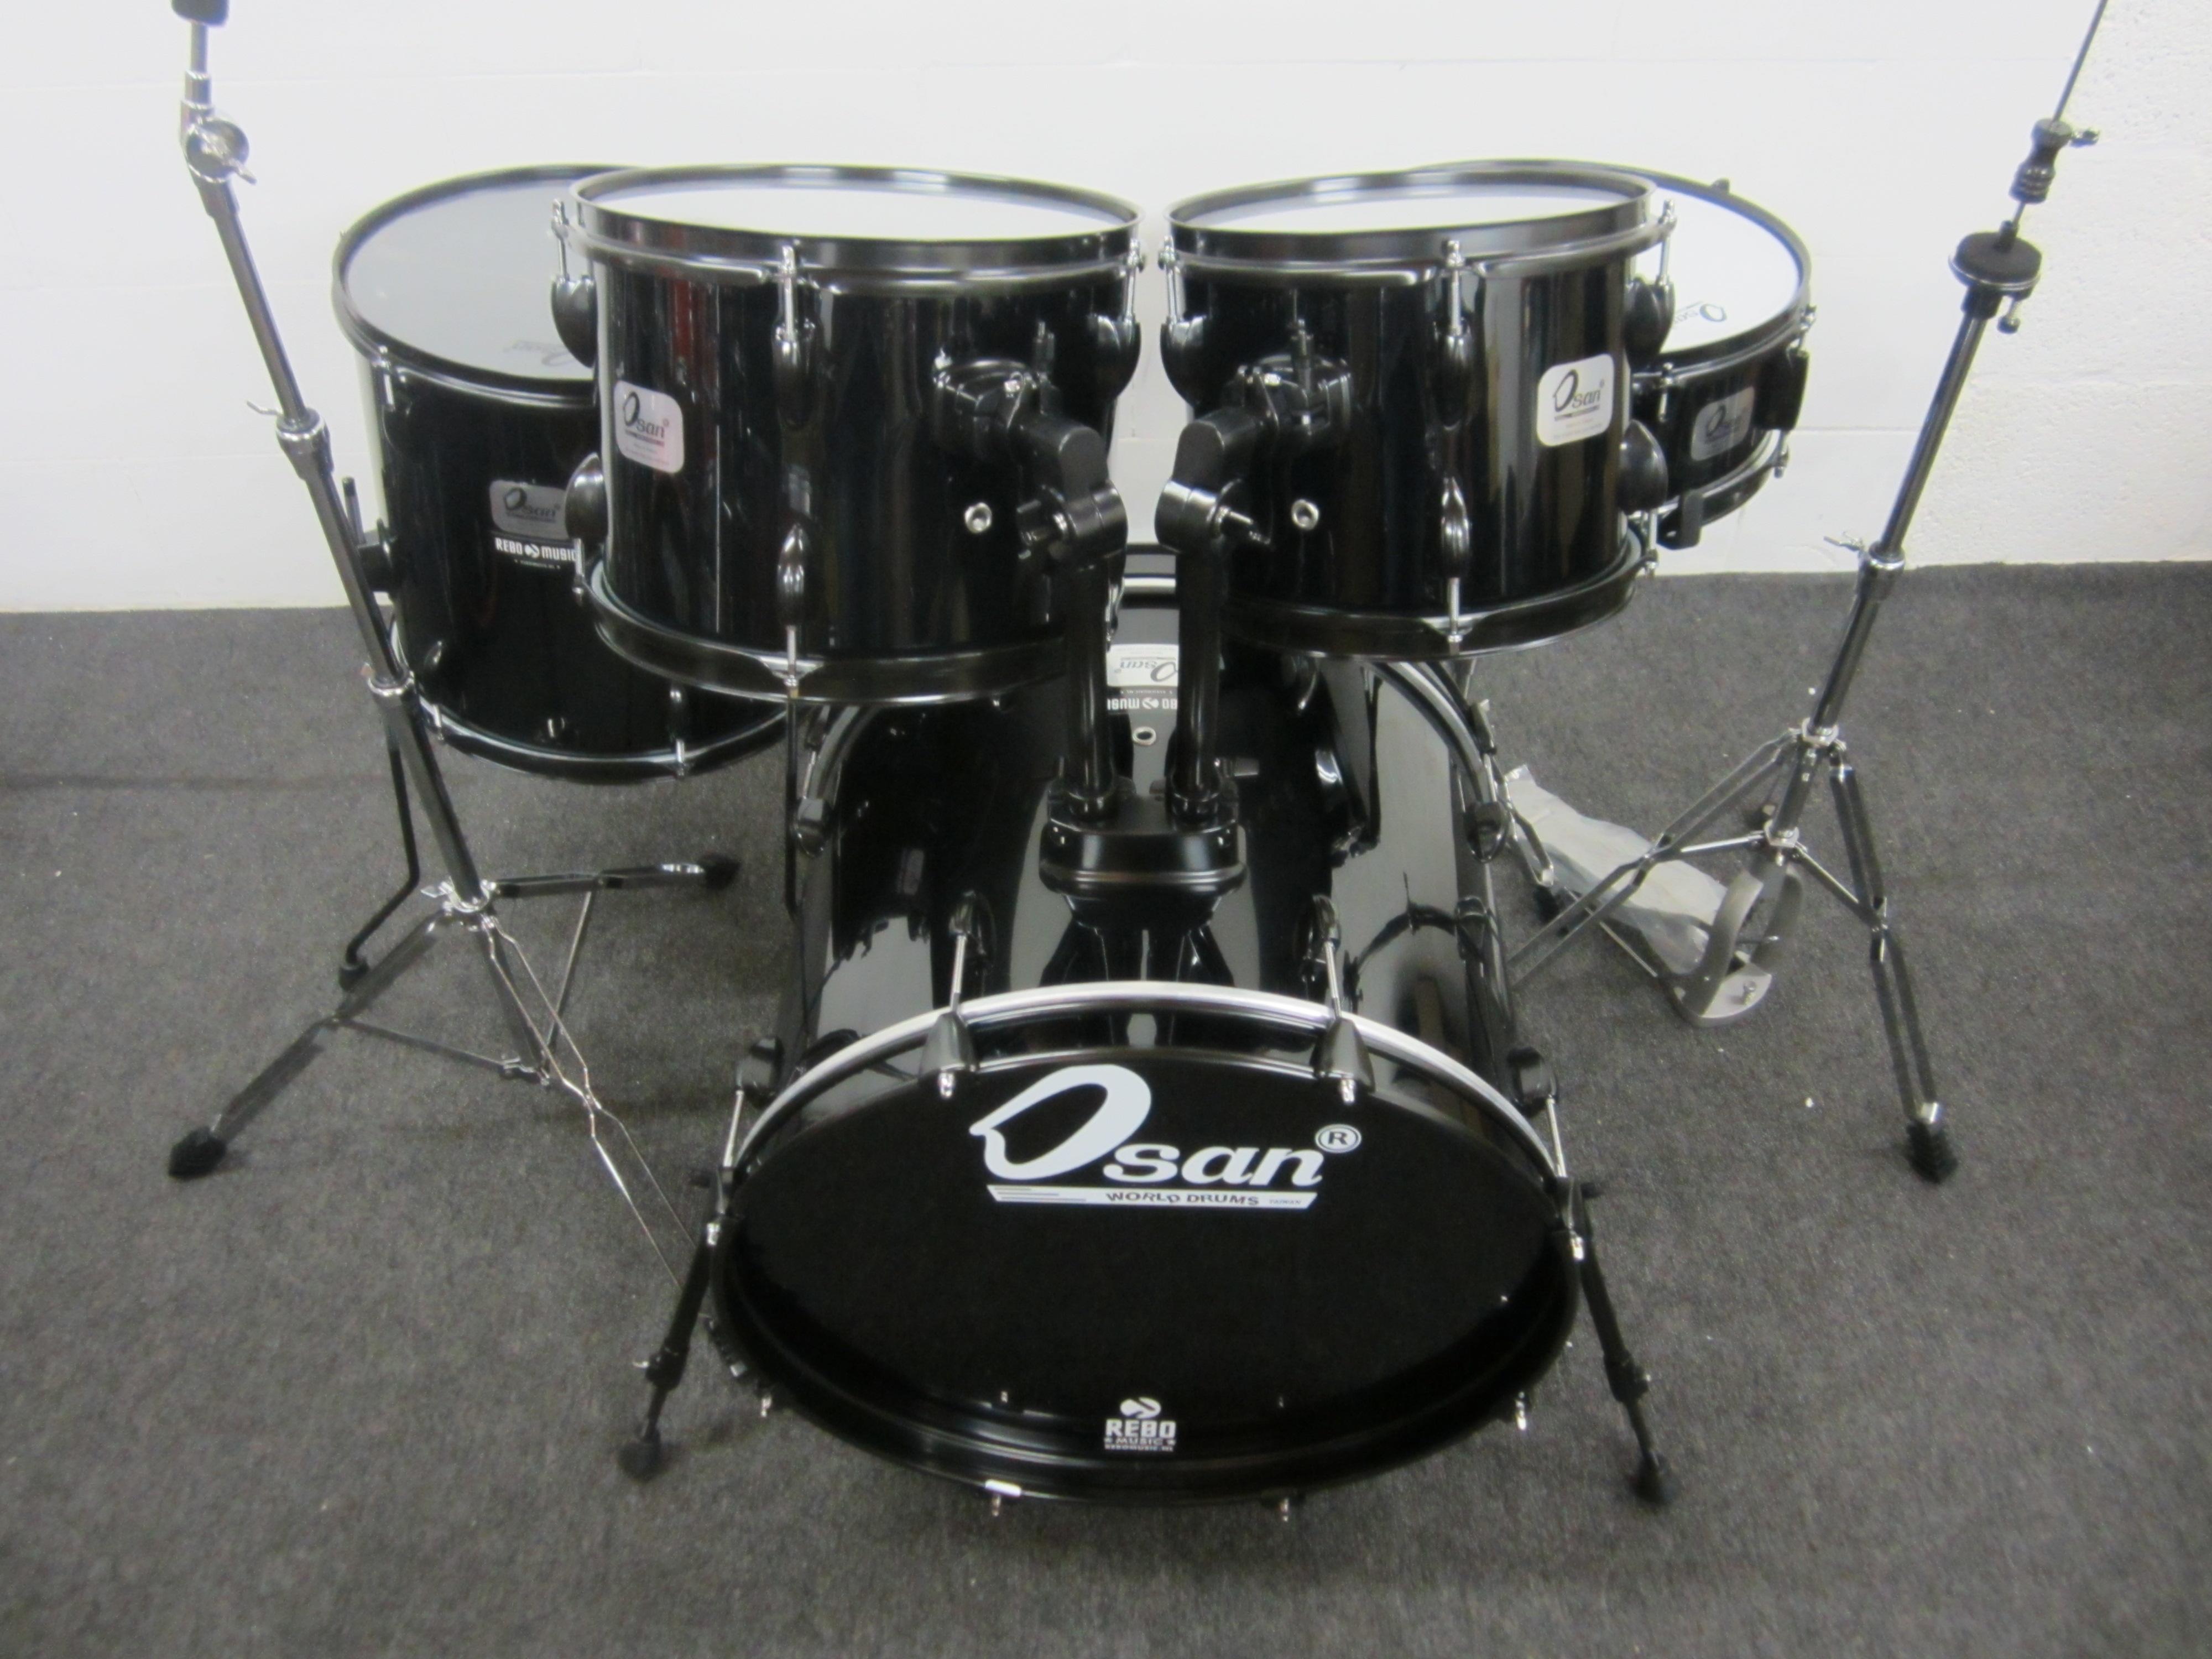 Welp Osan 2000 Fusion - Rebo Music VL-21